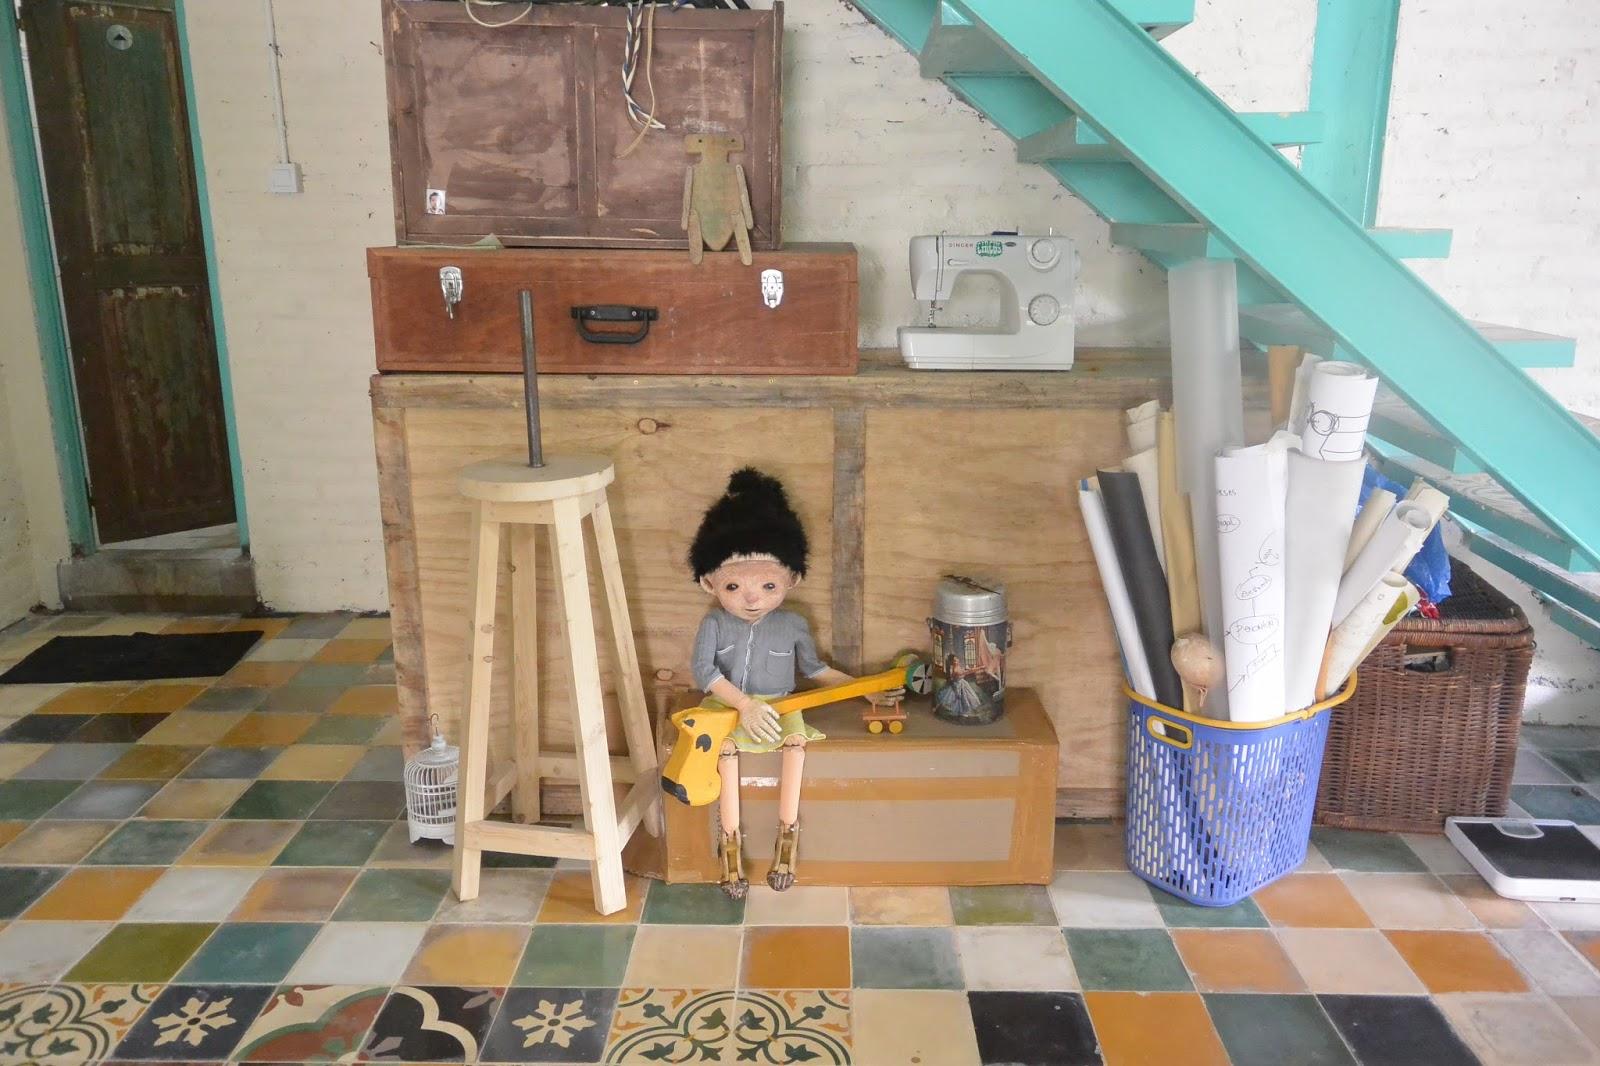 Papermoon Puppet Theatre, Alternatif Wisata Edukatif Di Yogyakarta